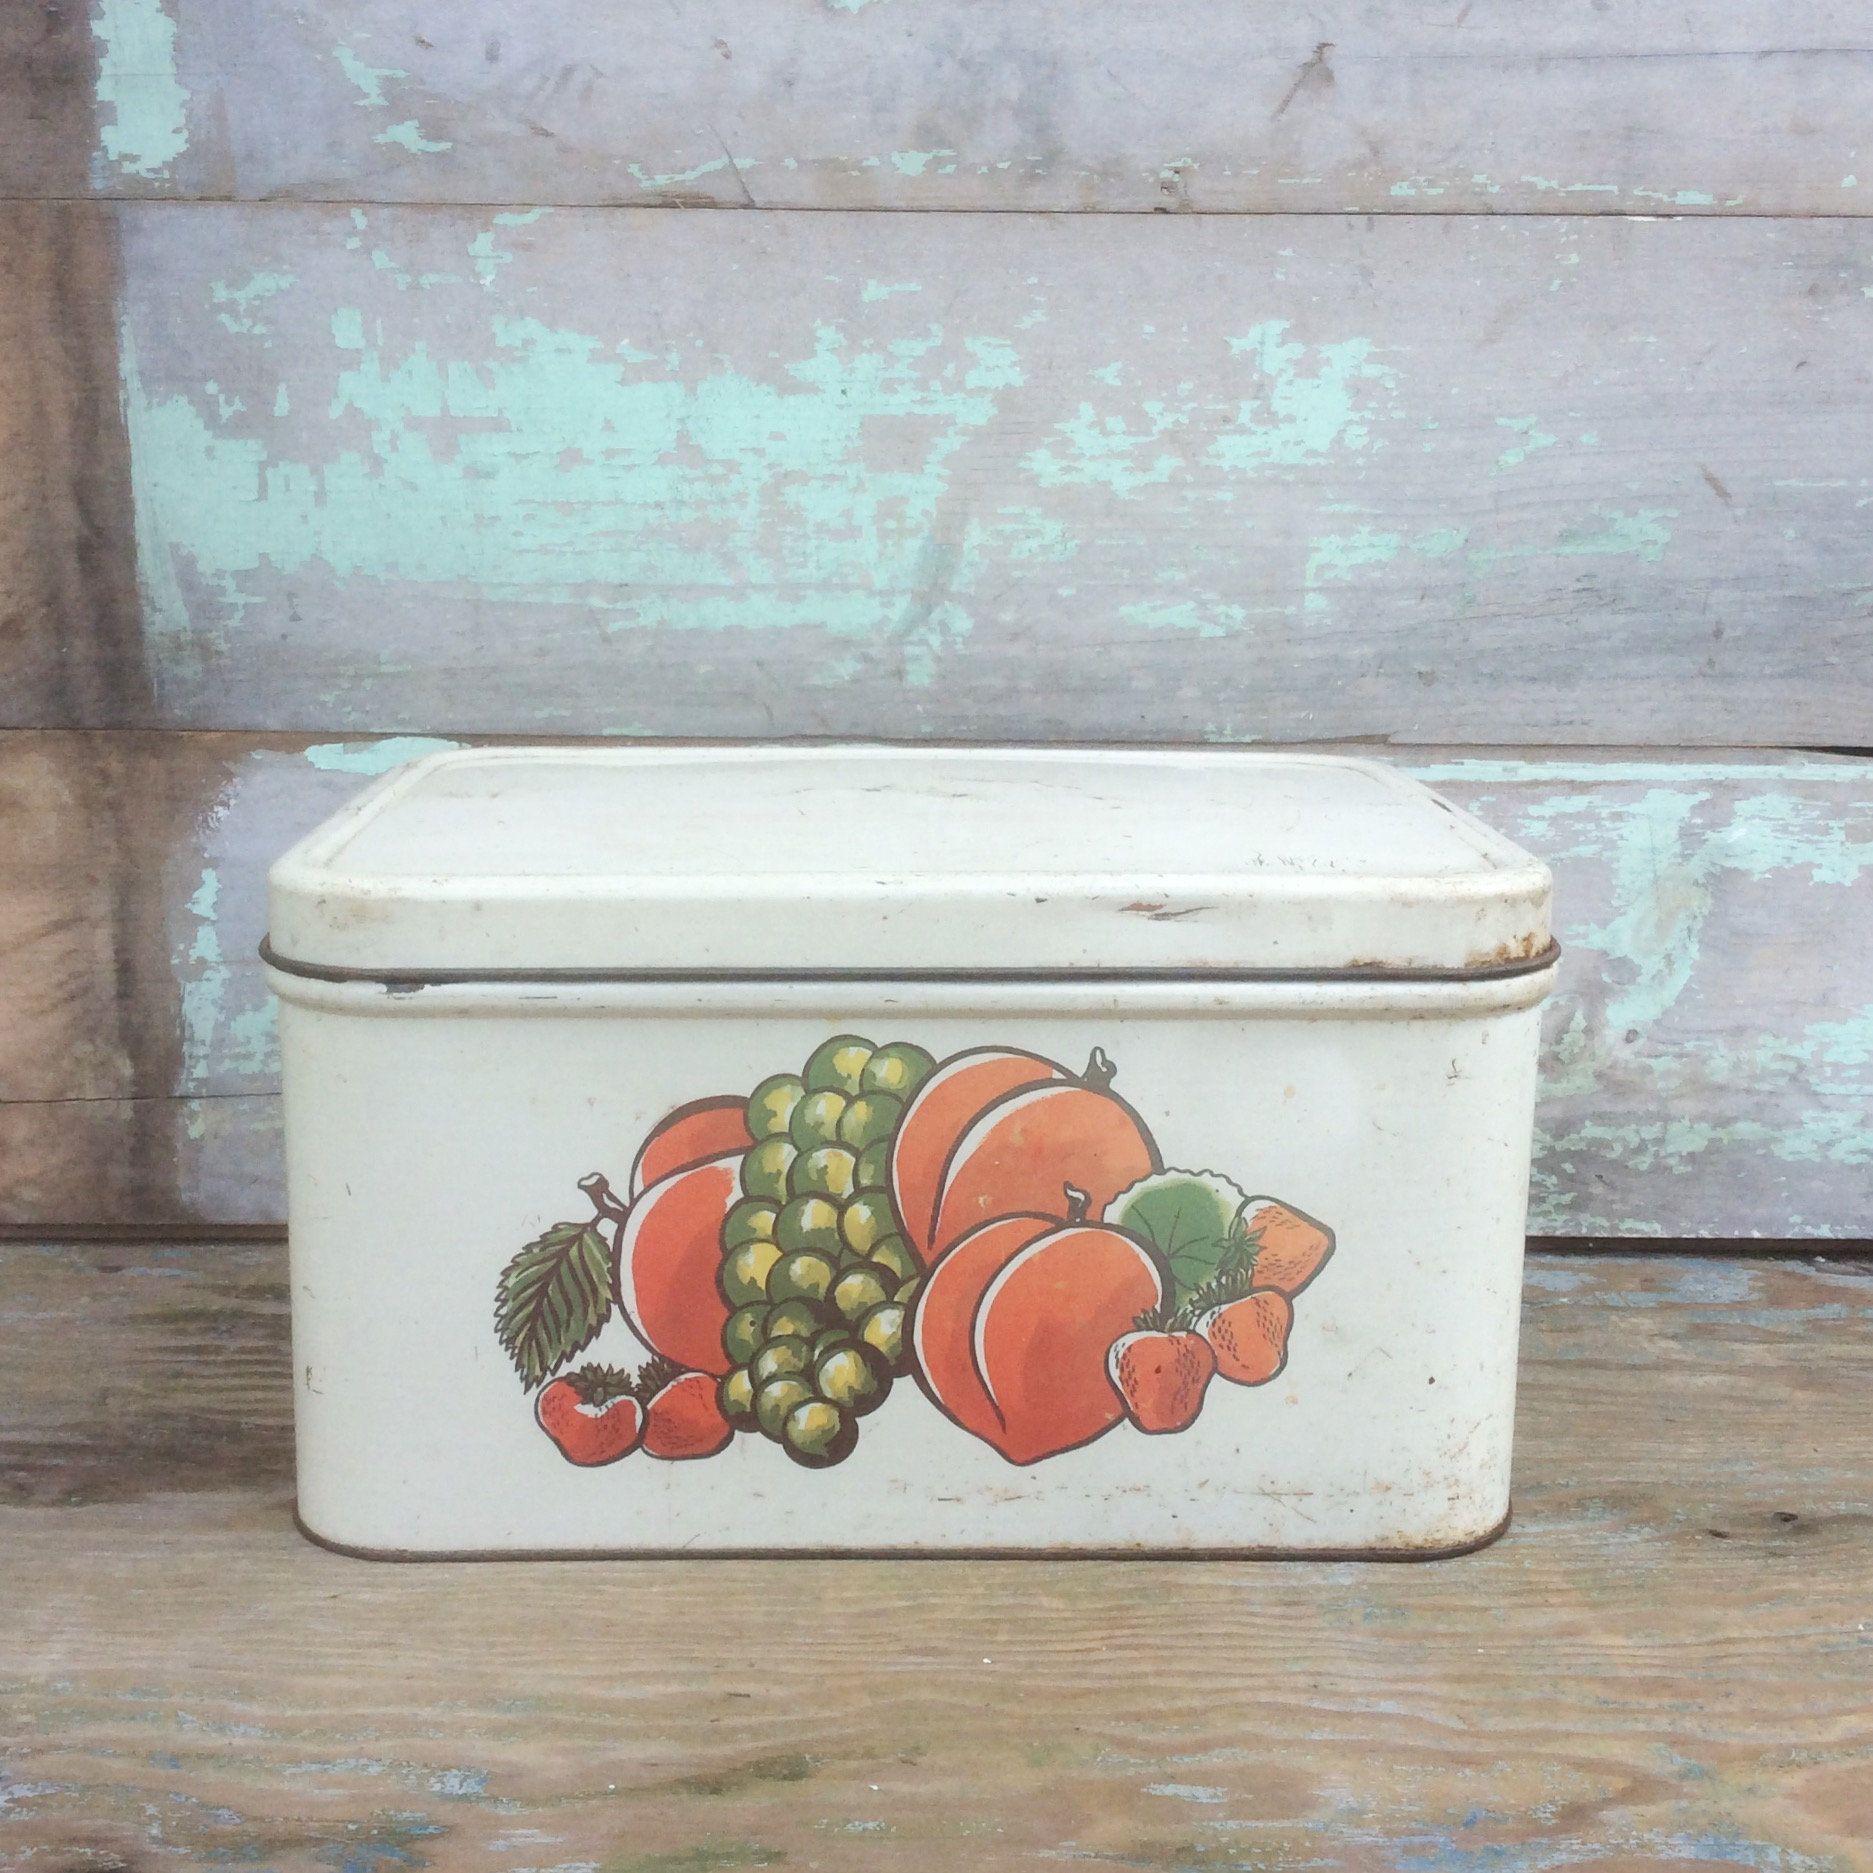 Vintage White Tin Metal Decoware Kitchen Bread Box Storage Container W Green Grapes Re Metal Tins Storage Boxes Green Grapes